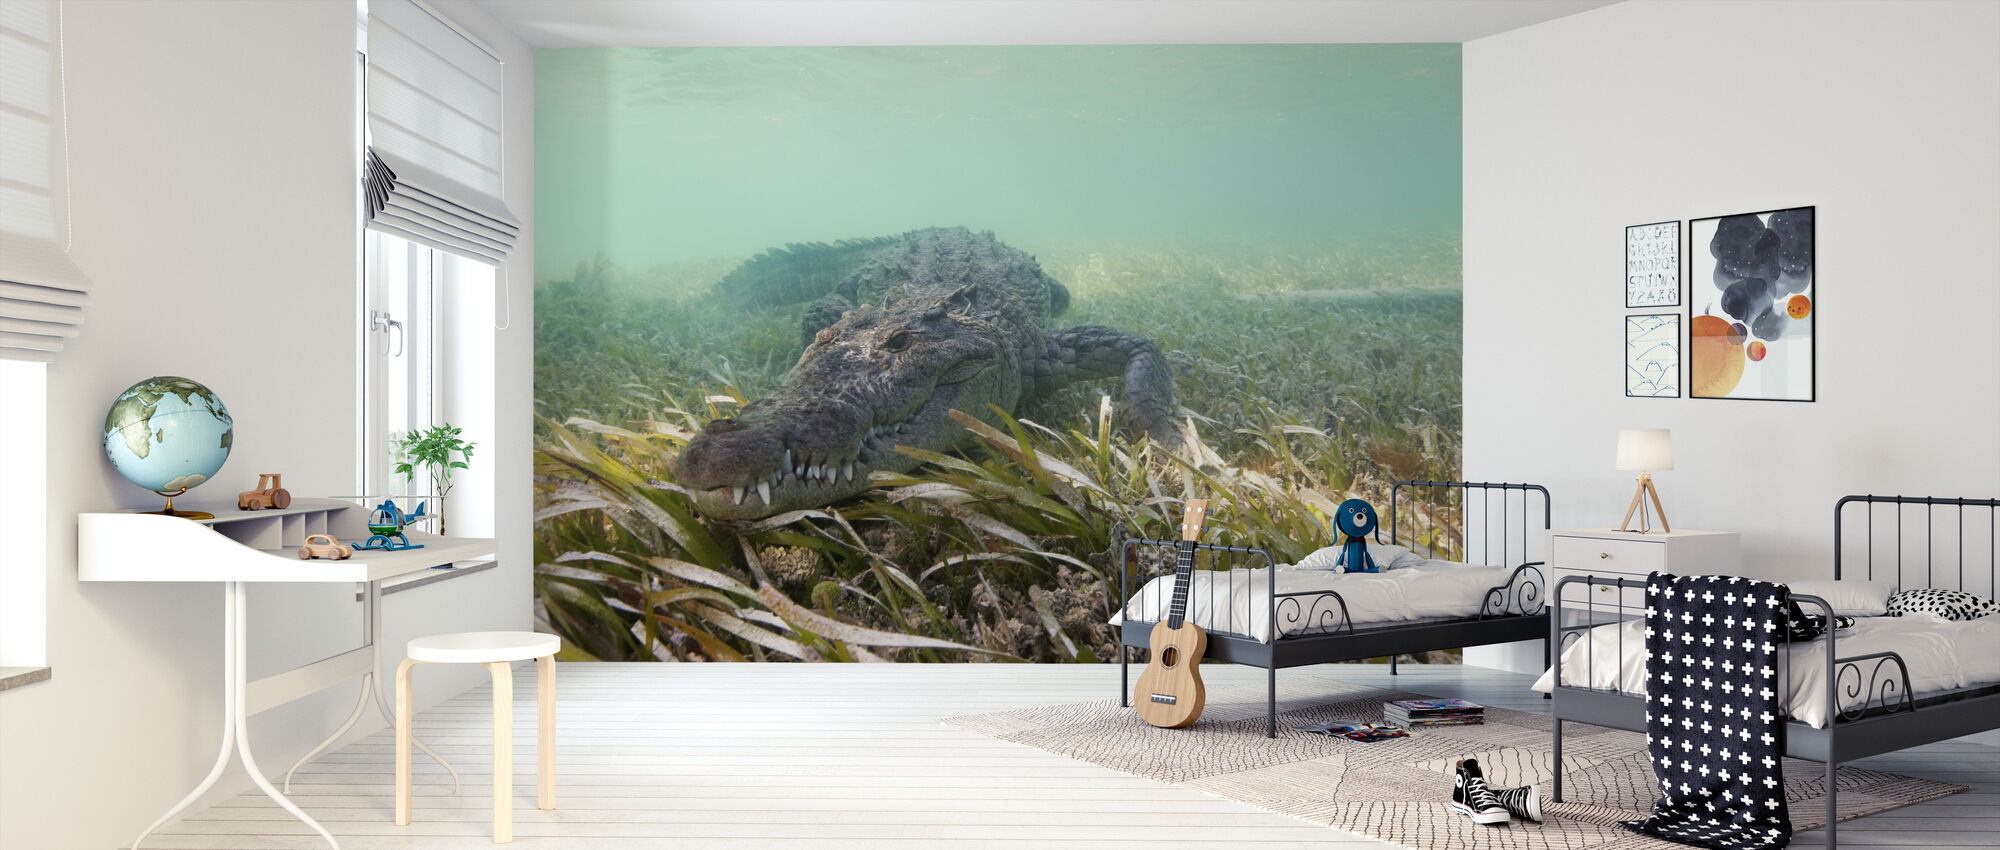 Amerikansk krokodille - Tapet - Barnerom